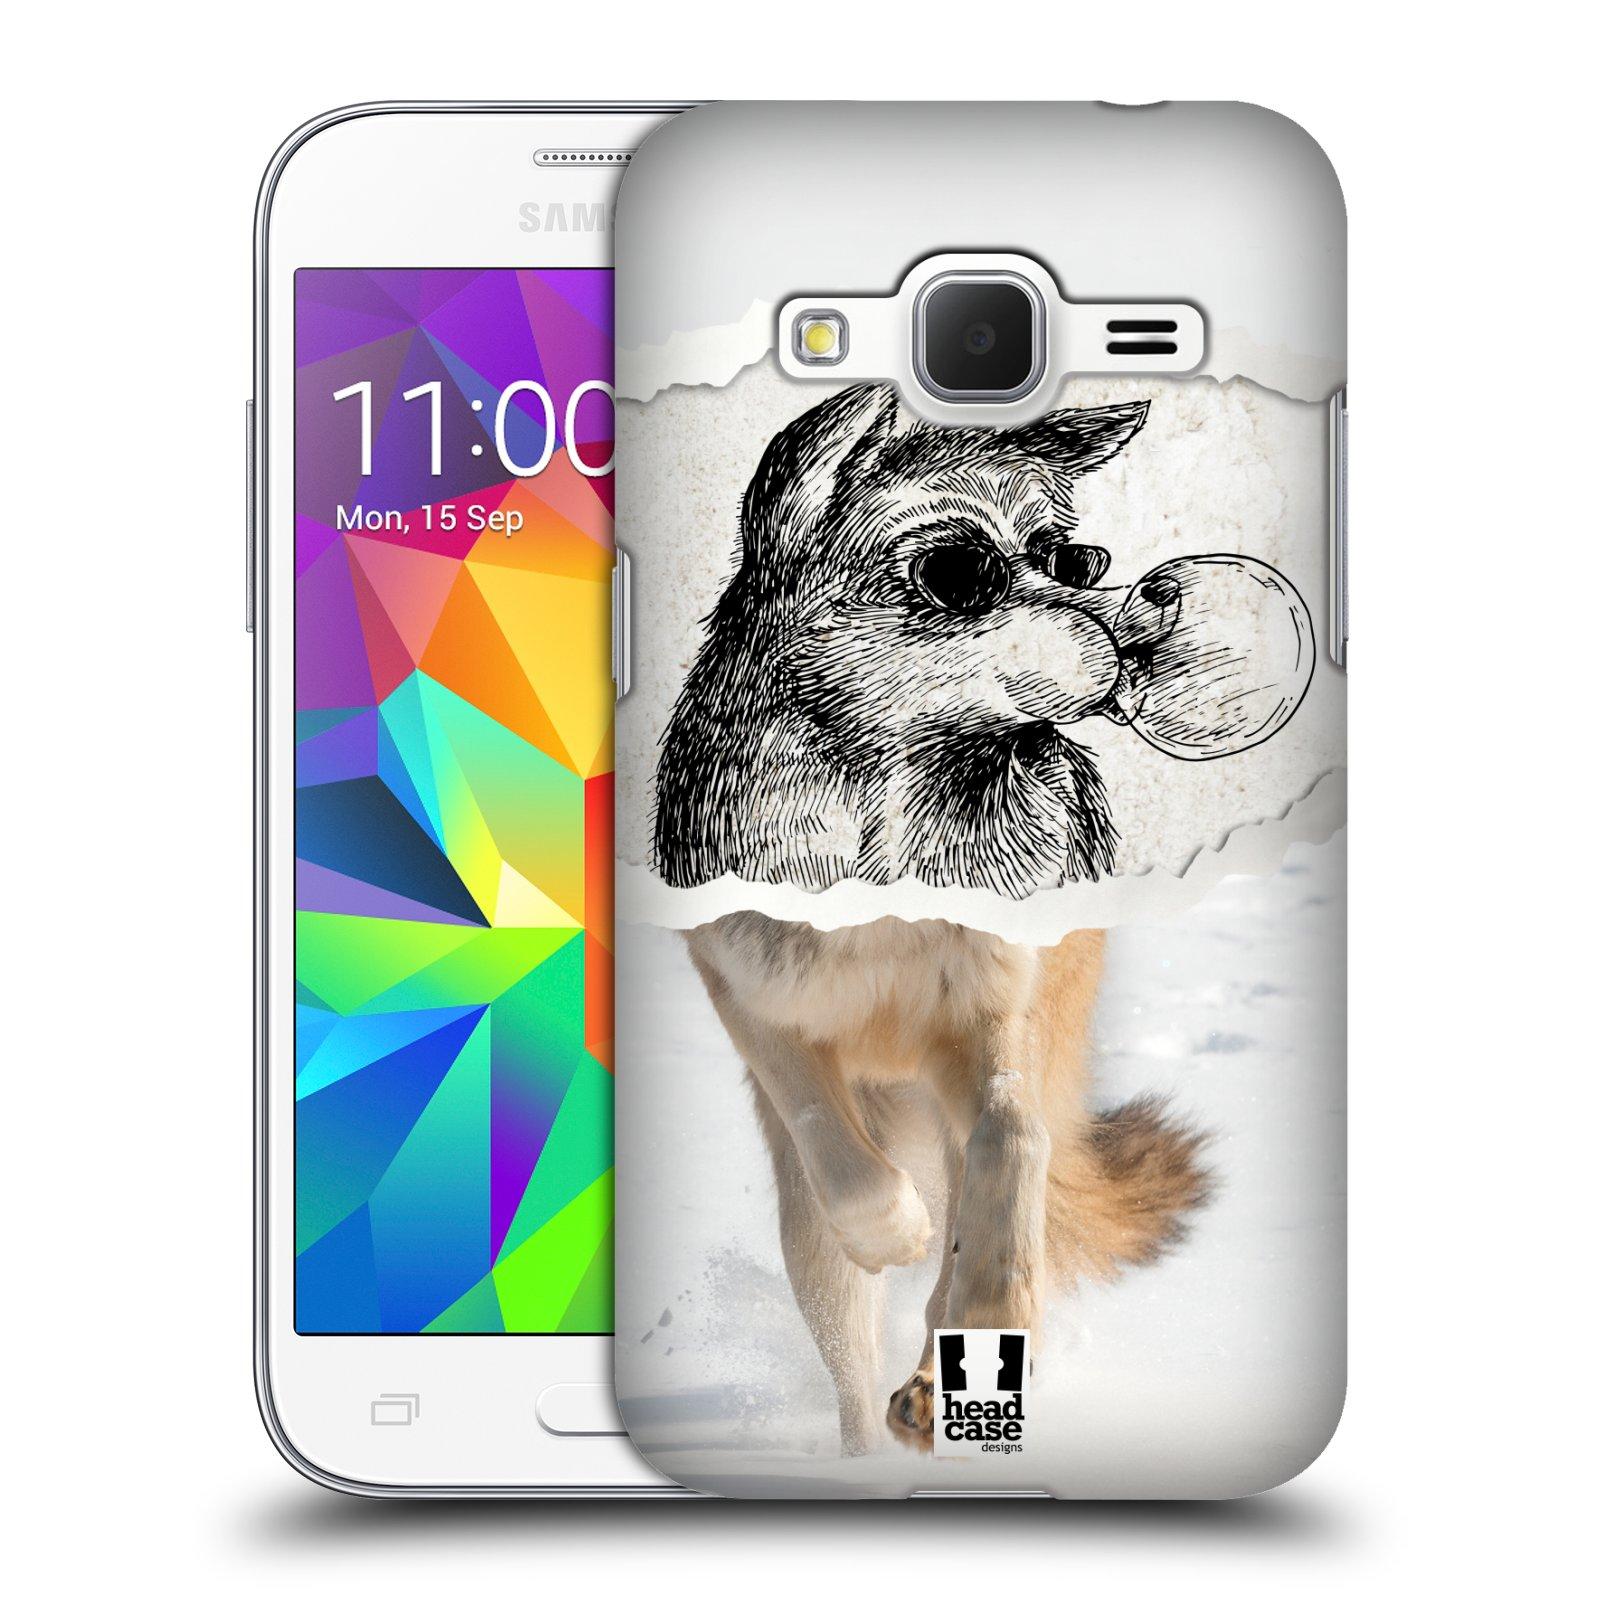 HEAD CASE plastový obal na mobil SAMSUNG GALAXY Core Prime (Core Prime VE) vzor zvířata koláž vlk pohodář